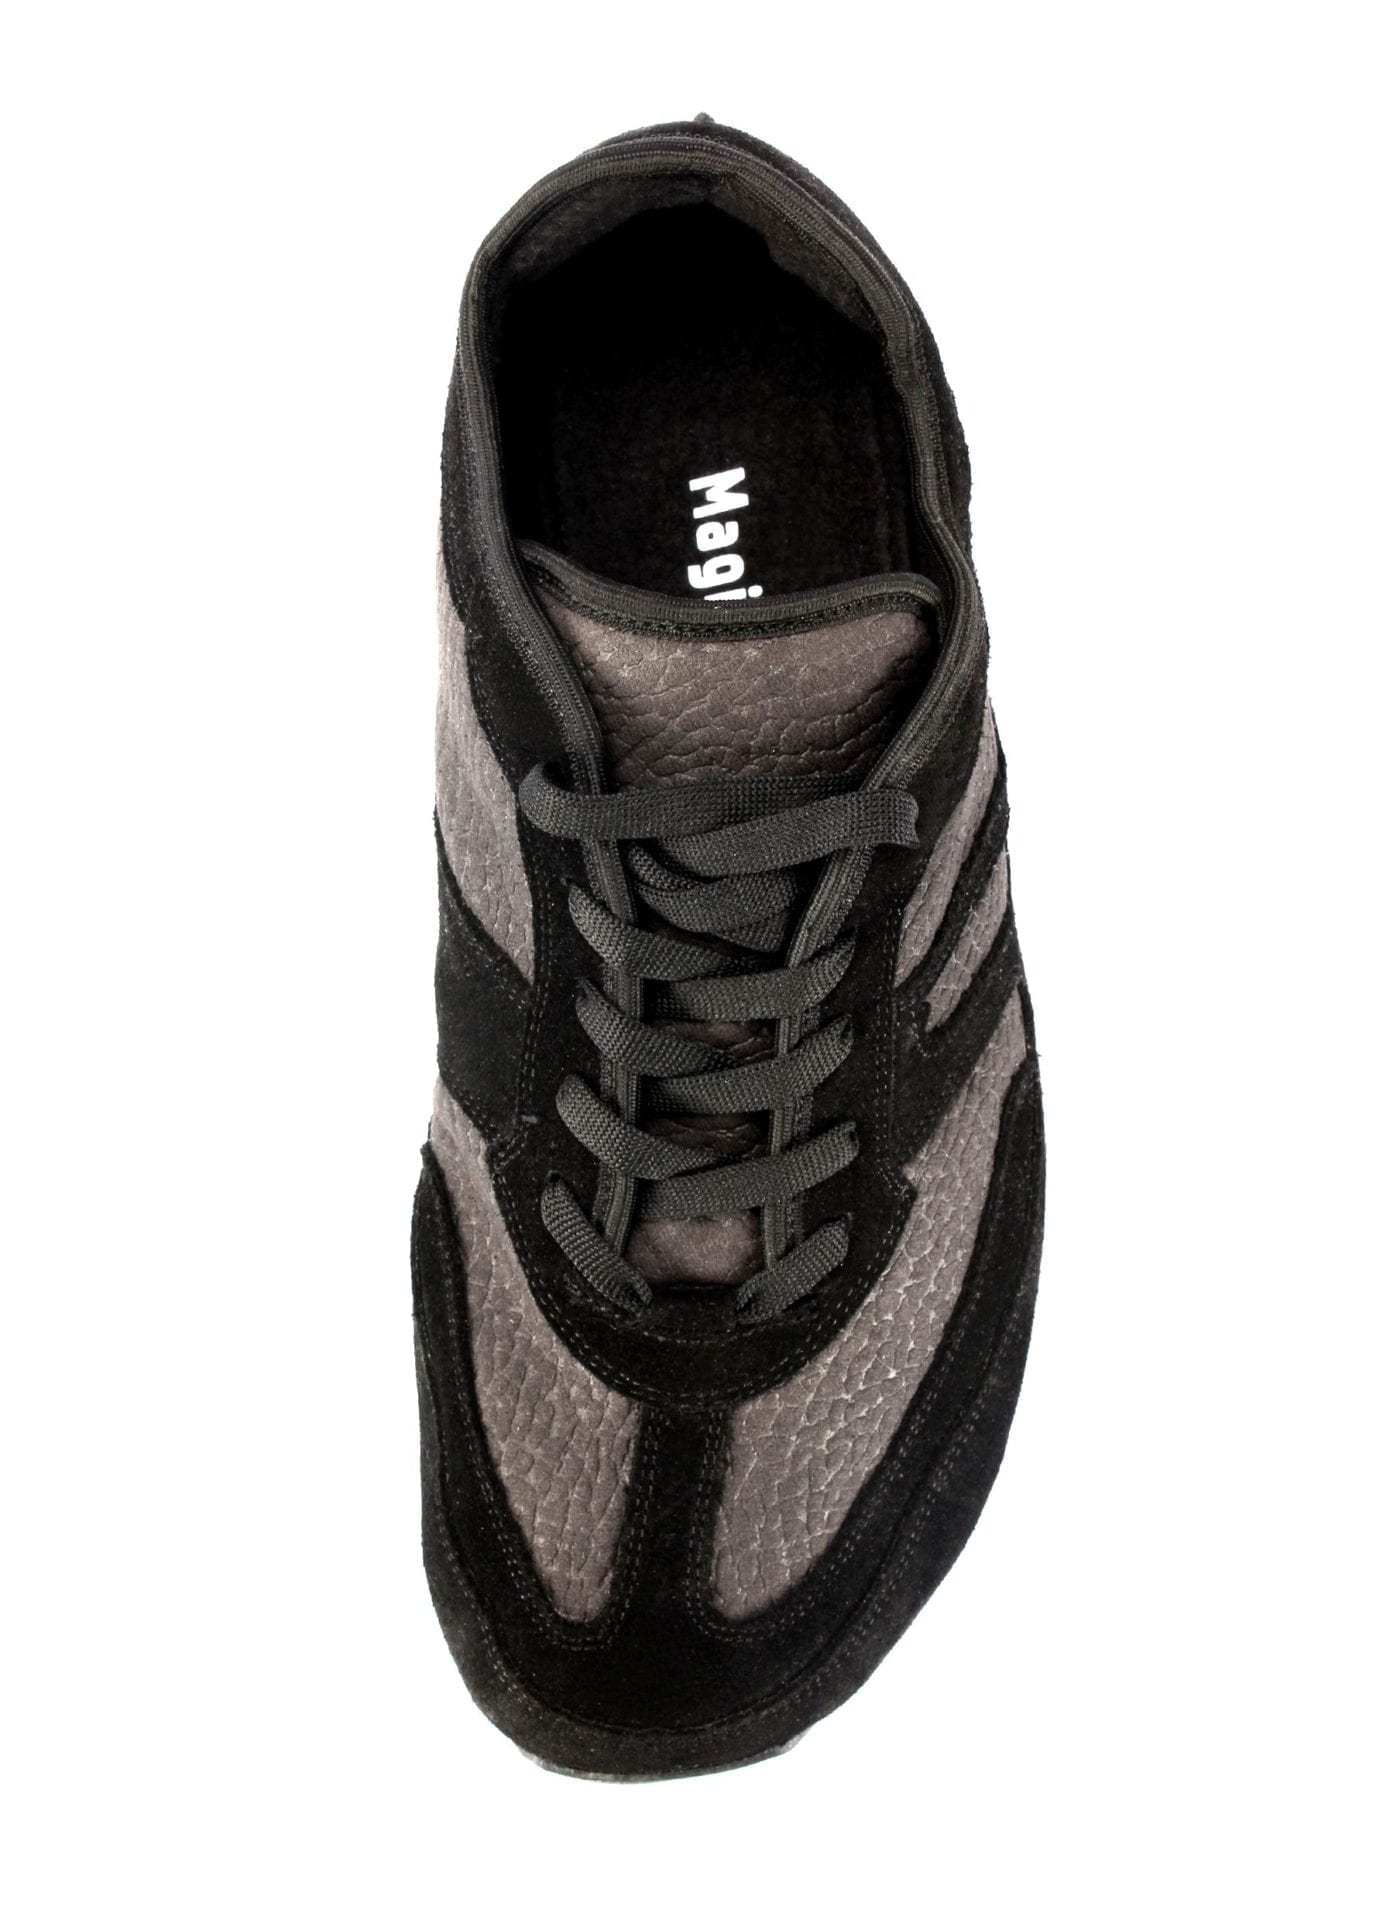 Magical Shoes BAREFOOT SHOES EXPLORER AUTUMN BARIBAL picture 4